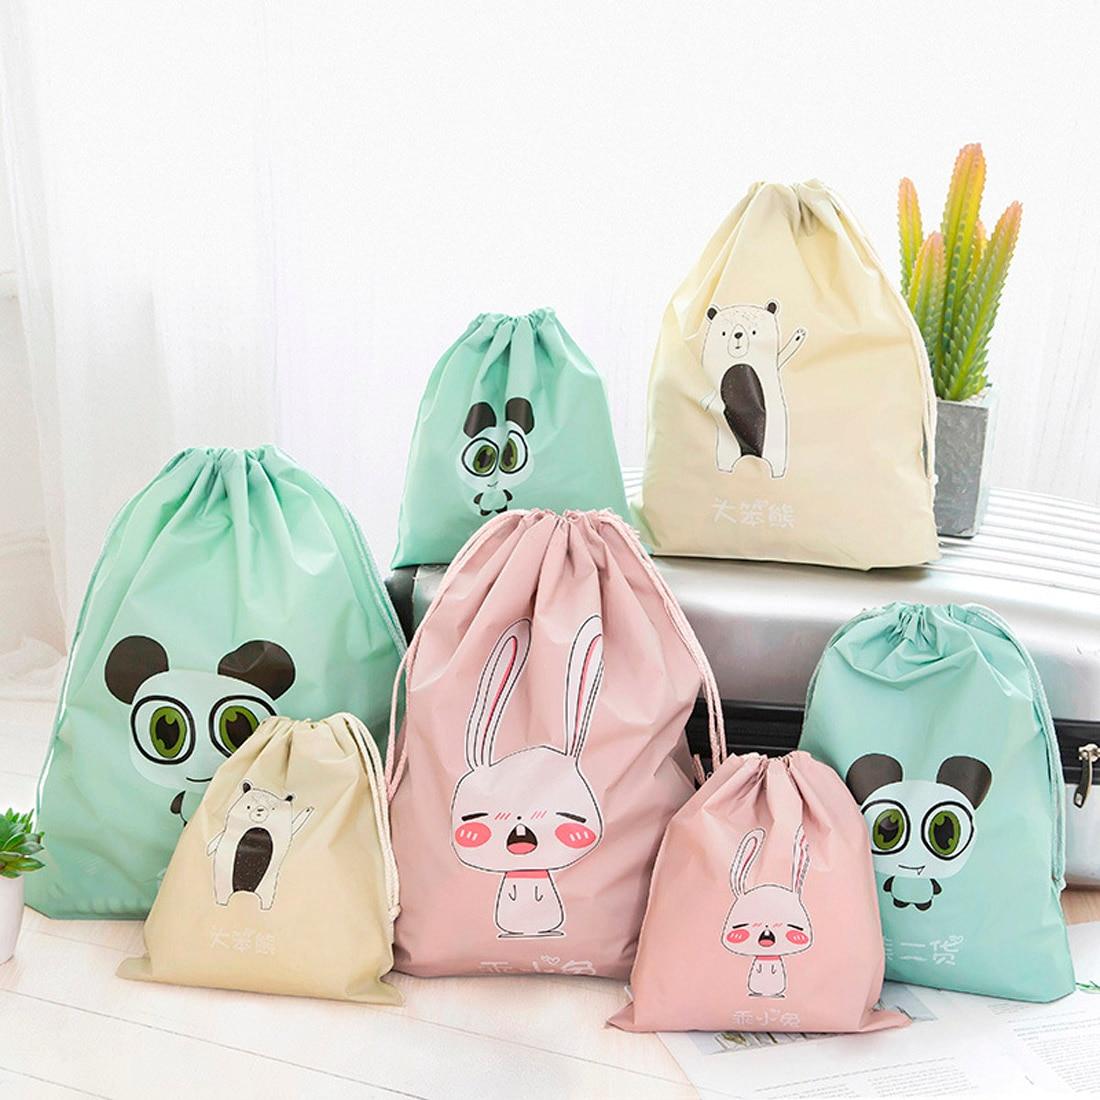 Waterproof Clothes Storage Bag Travel Packing Bag Breast Milk Polar Bear Stripe Lingerie Makeup Drawstring Bag